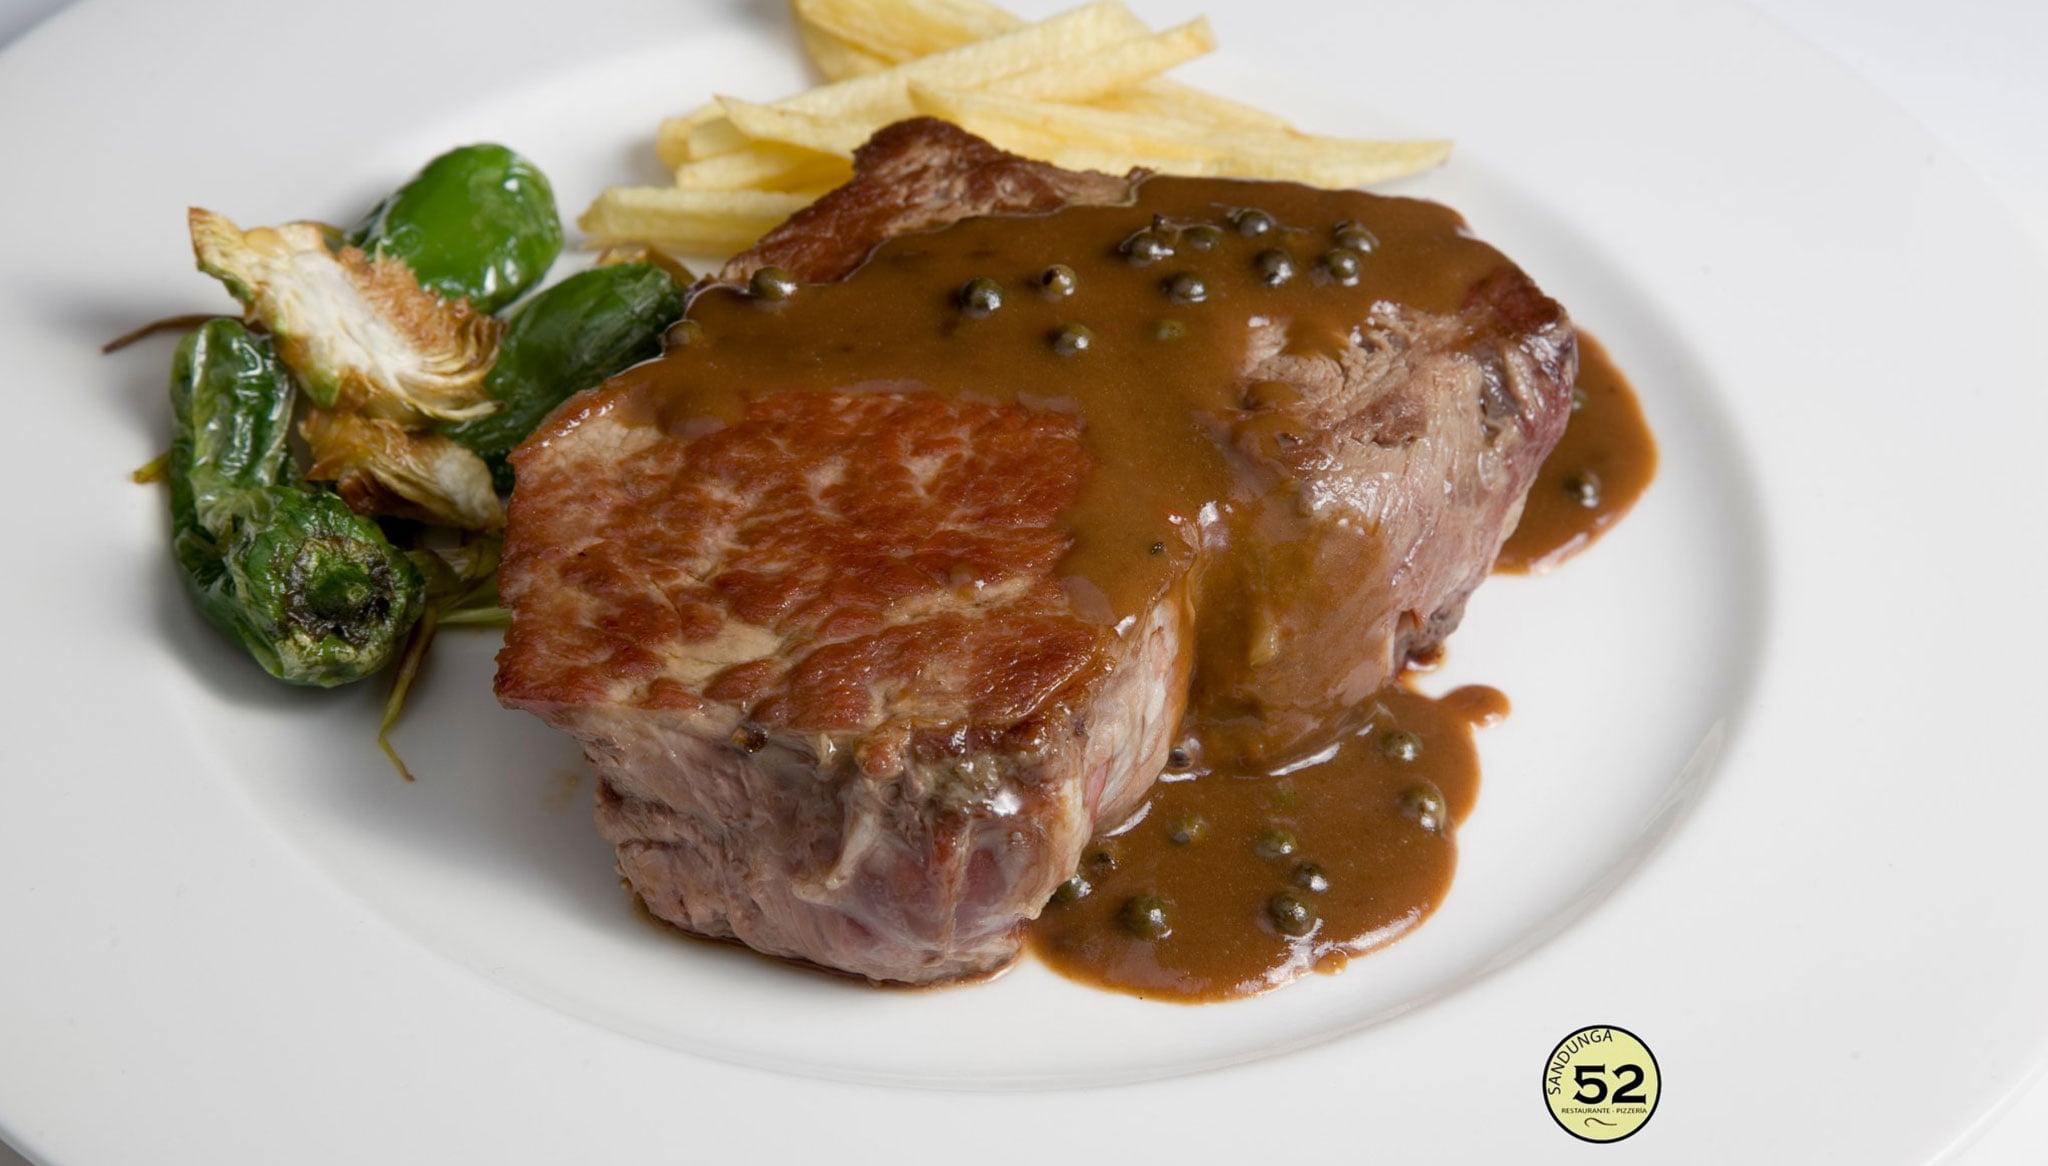 Tasty meat dish - Sandunga 52